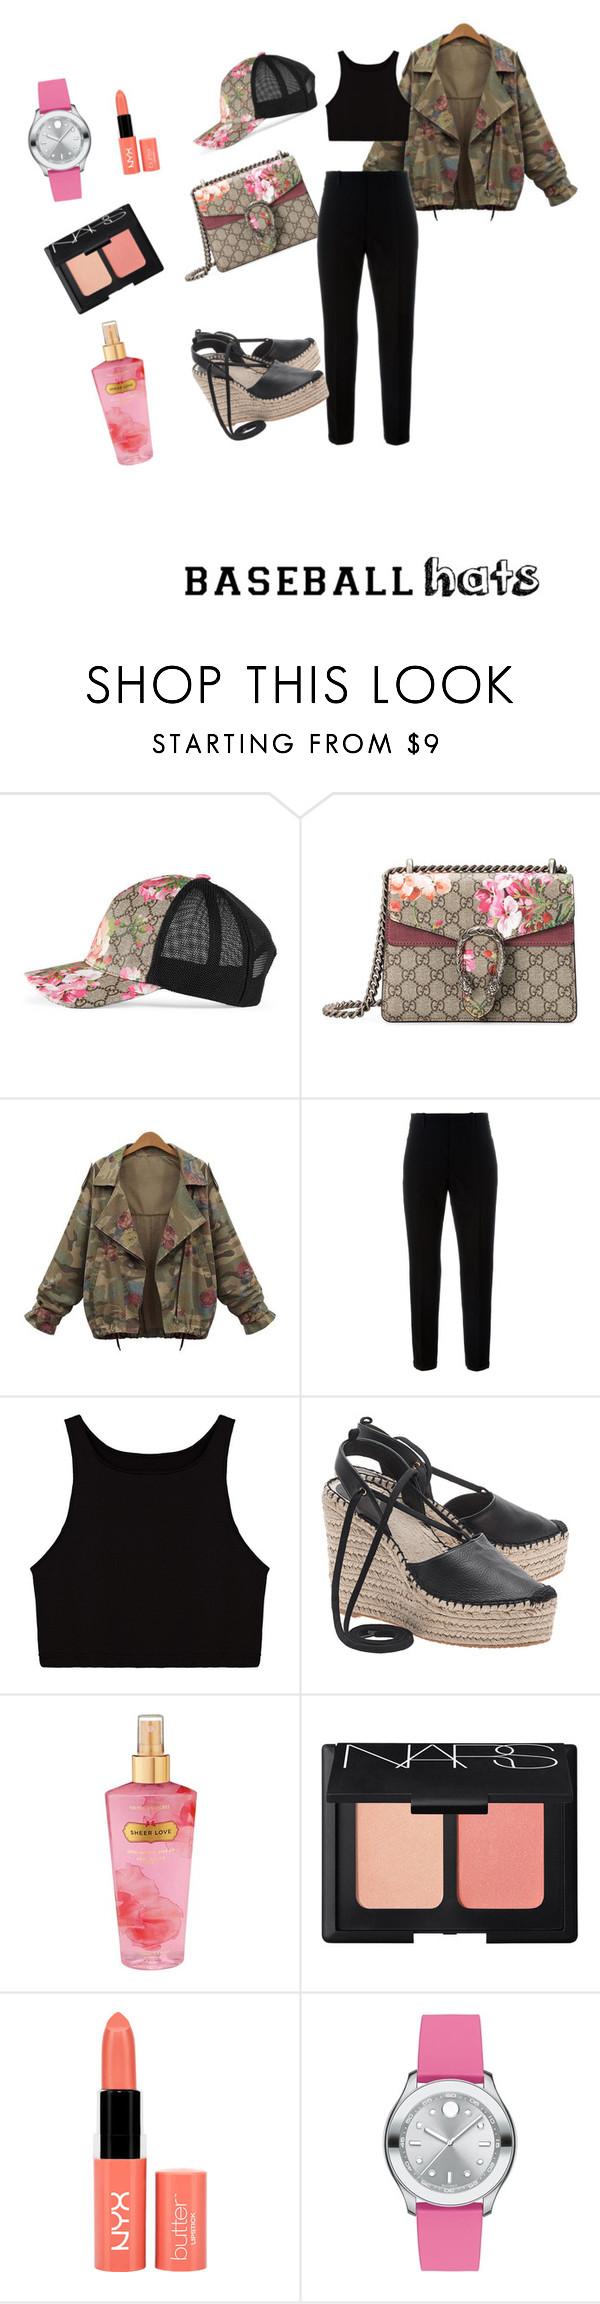 """my style"" by jennve ❤ liked on Polyvore featuring Gucci, Marni, Ash, Victoria's Secret, NARS Cosmetics, NYX, Movado, baseballcap and baseballhats"